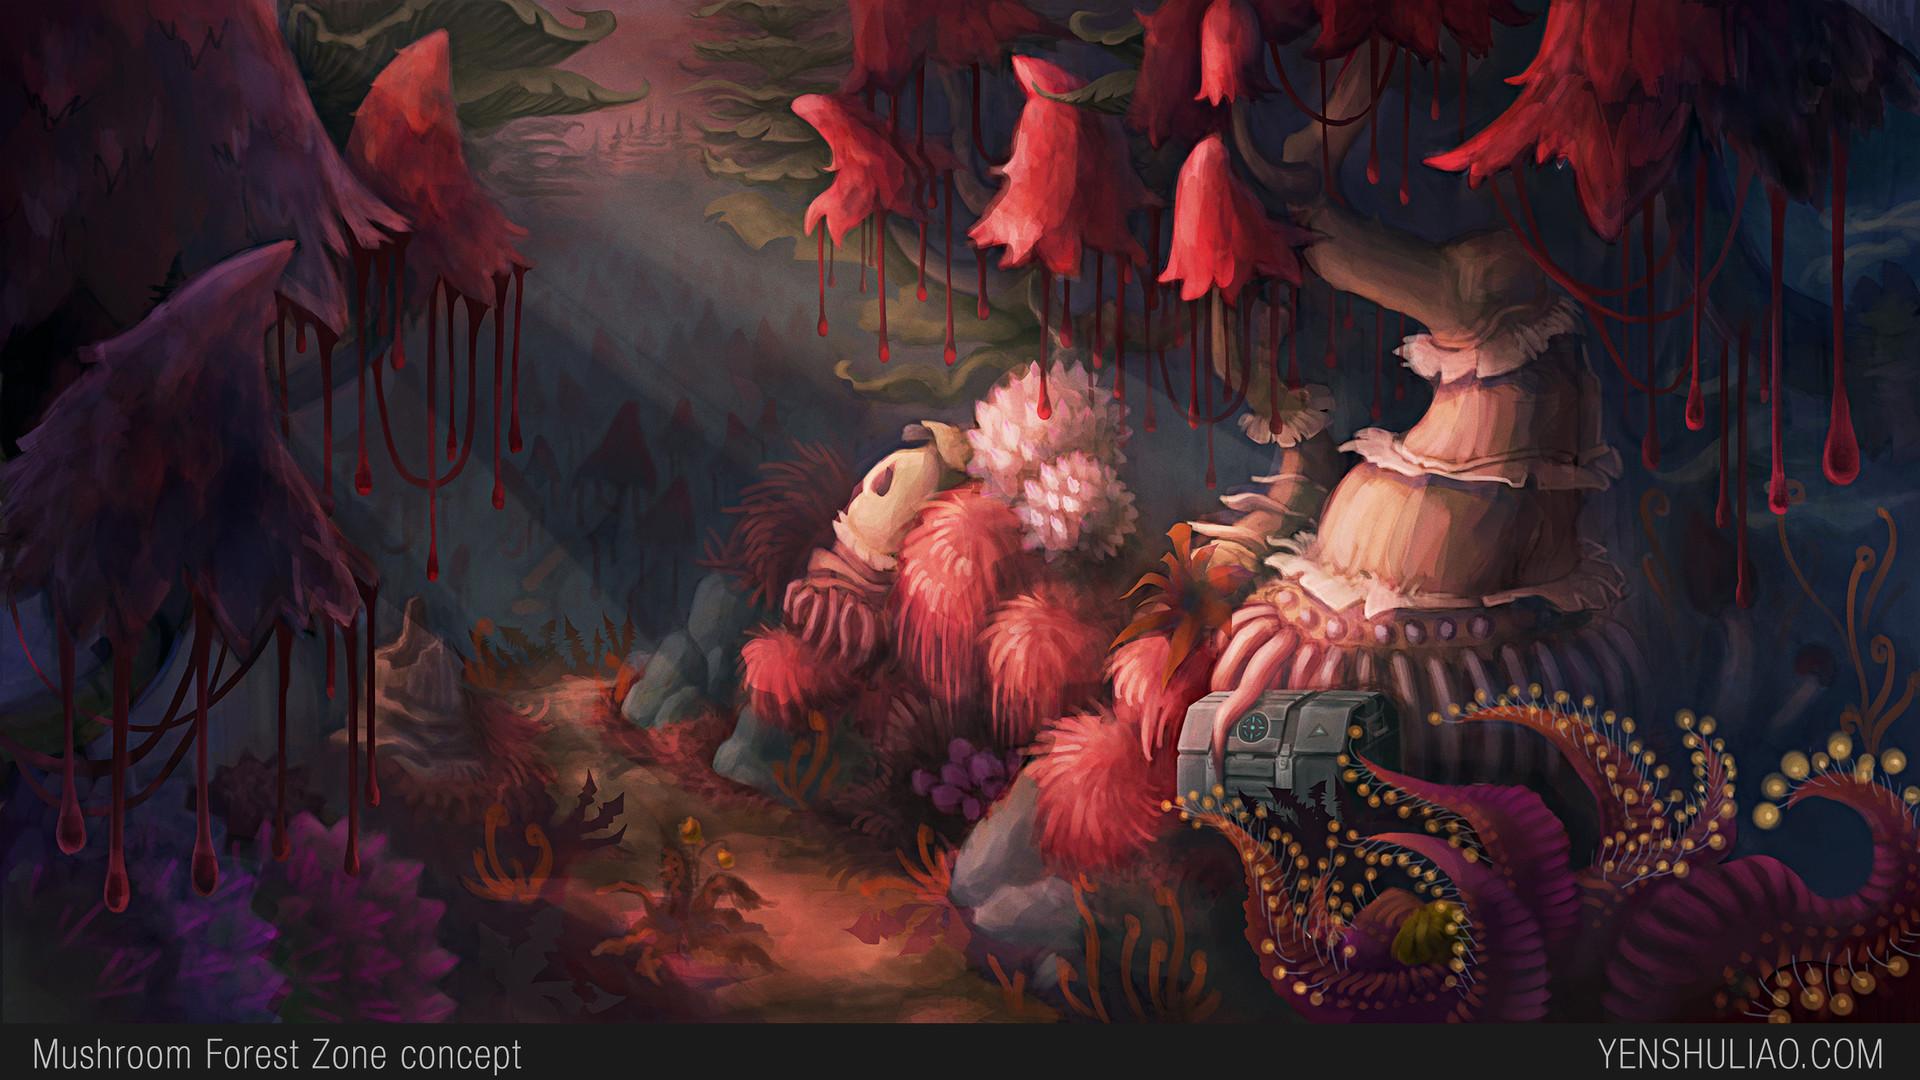 Yen shu liao environment concept art yen shu liao mushroom forest